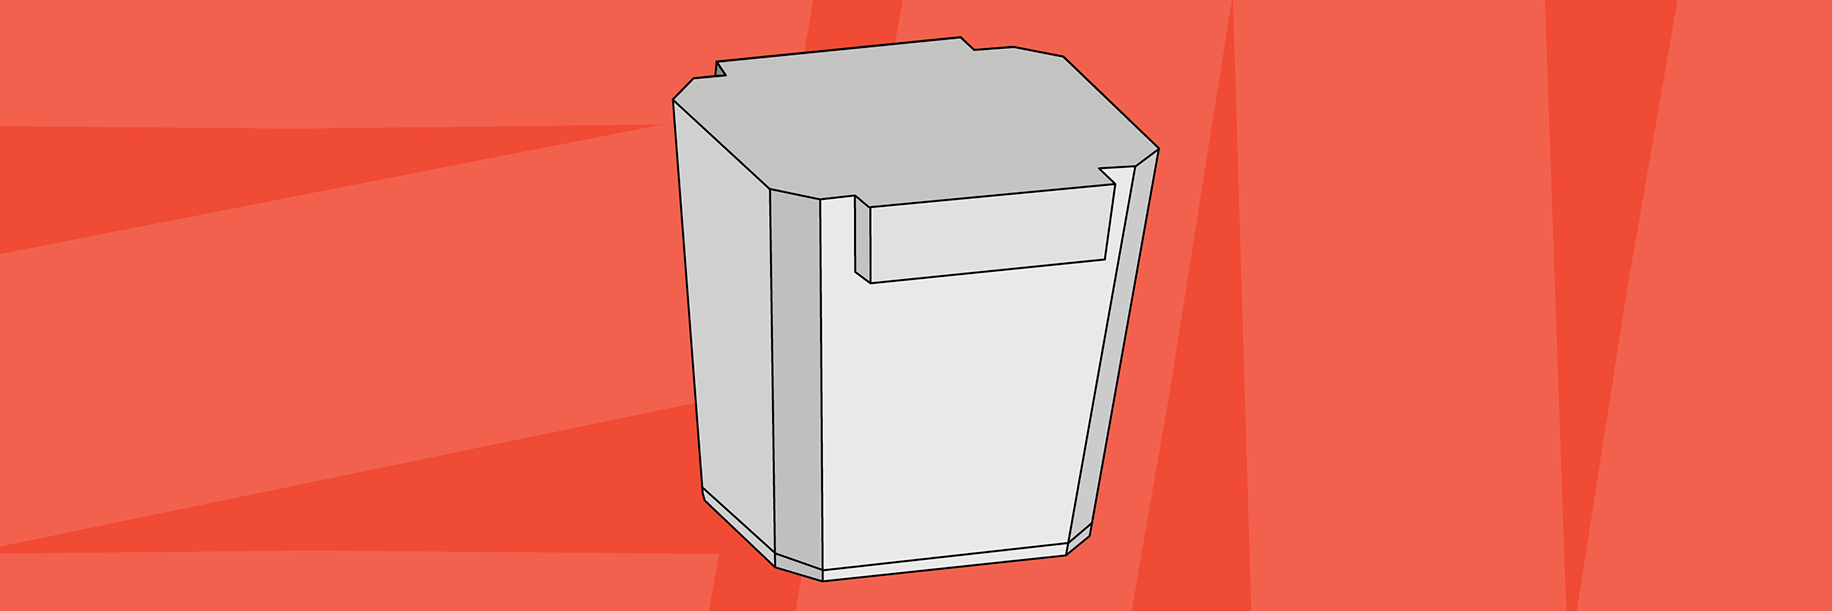 Vertical Jumbo Block from REAZN